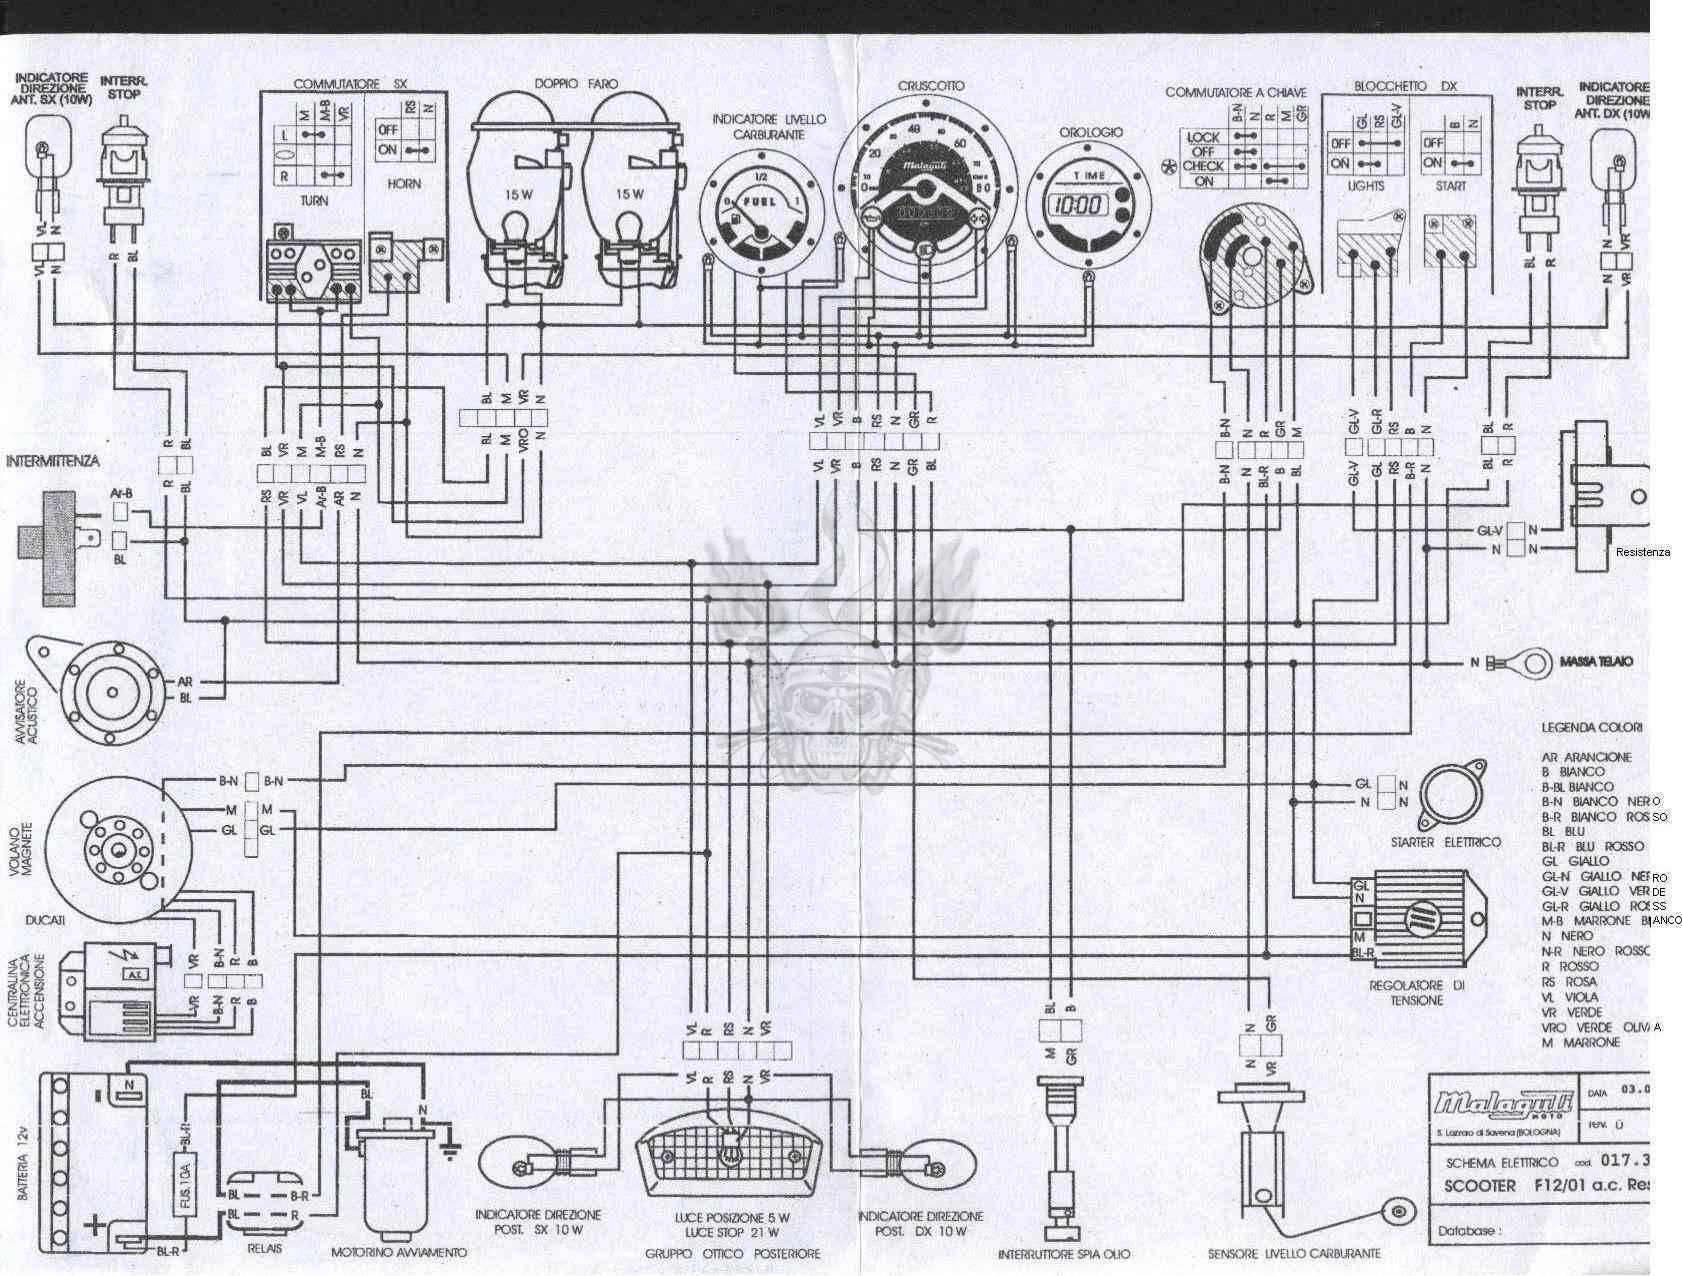 medium resolution of malaguti motorcycle manuals pdf wiring diagrams u0026 fault codes mix download moto schem malaguti f12 phantom ac bj01 scooter